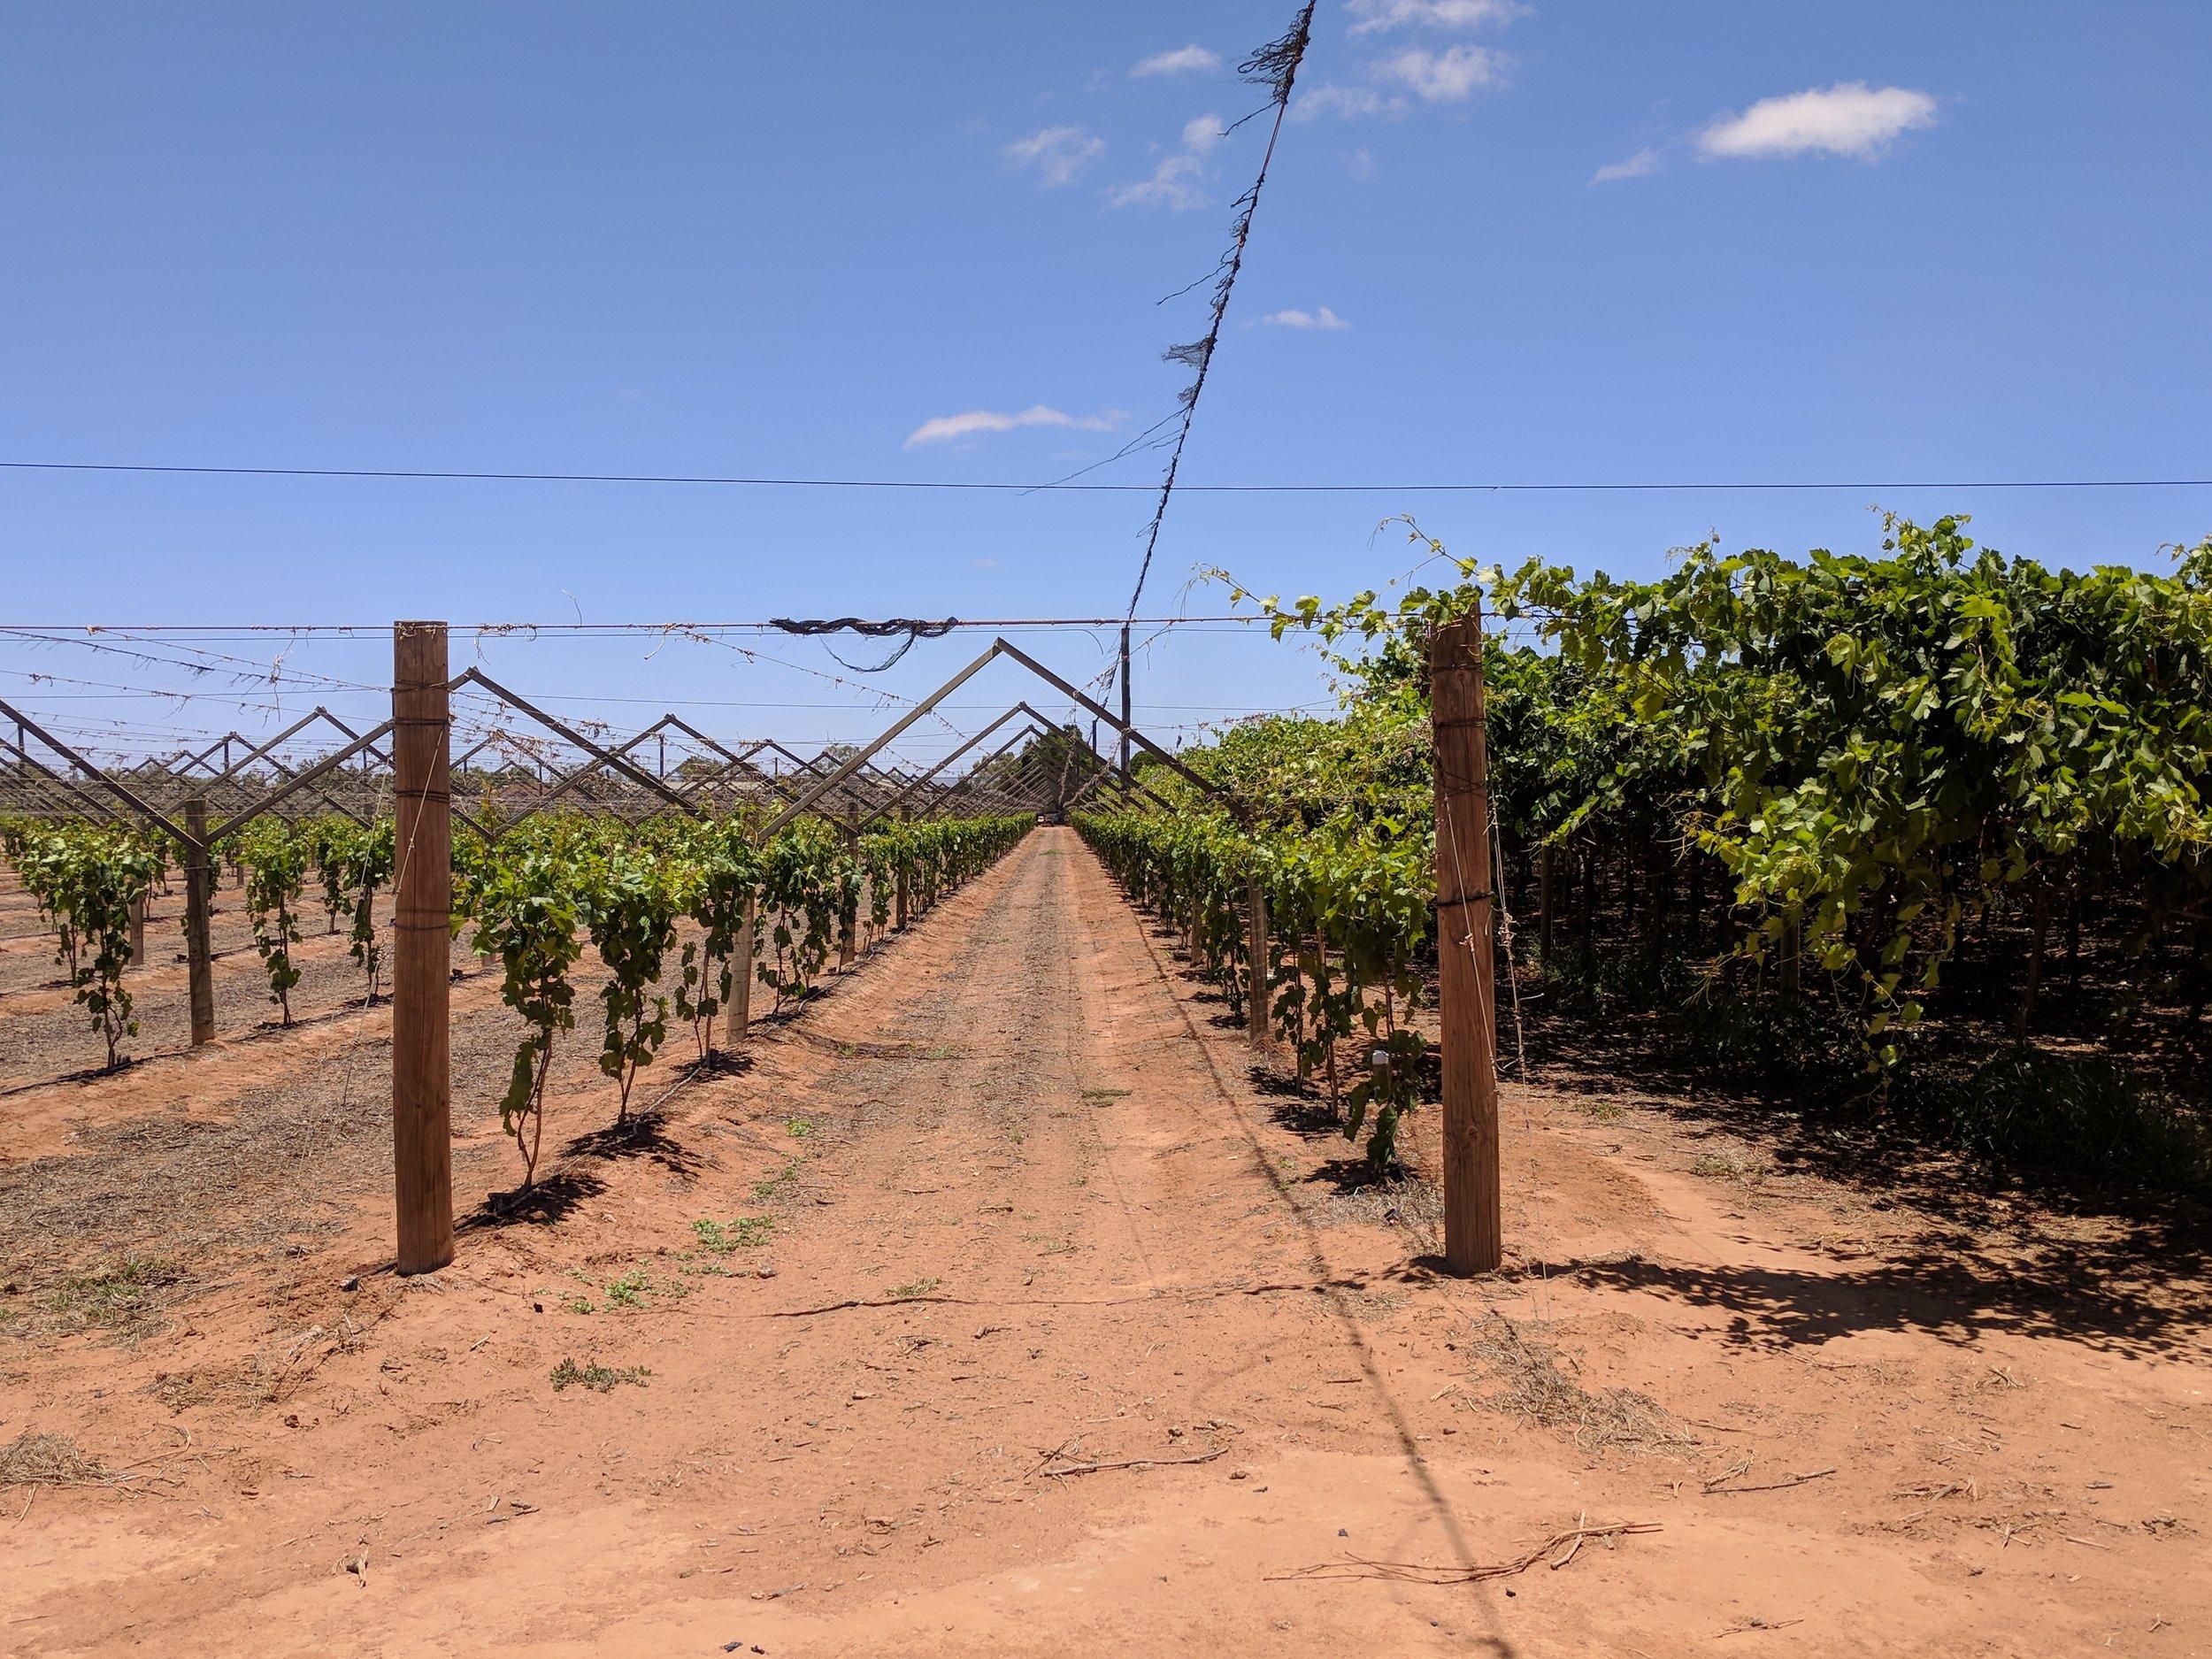 Grape growing trellis structures